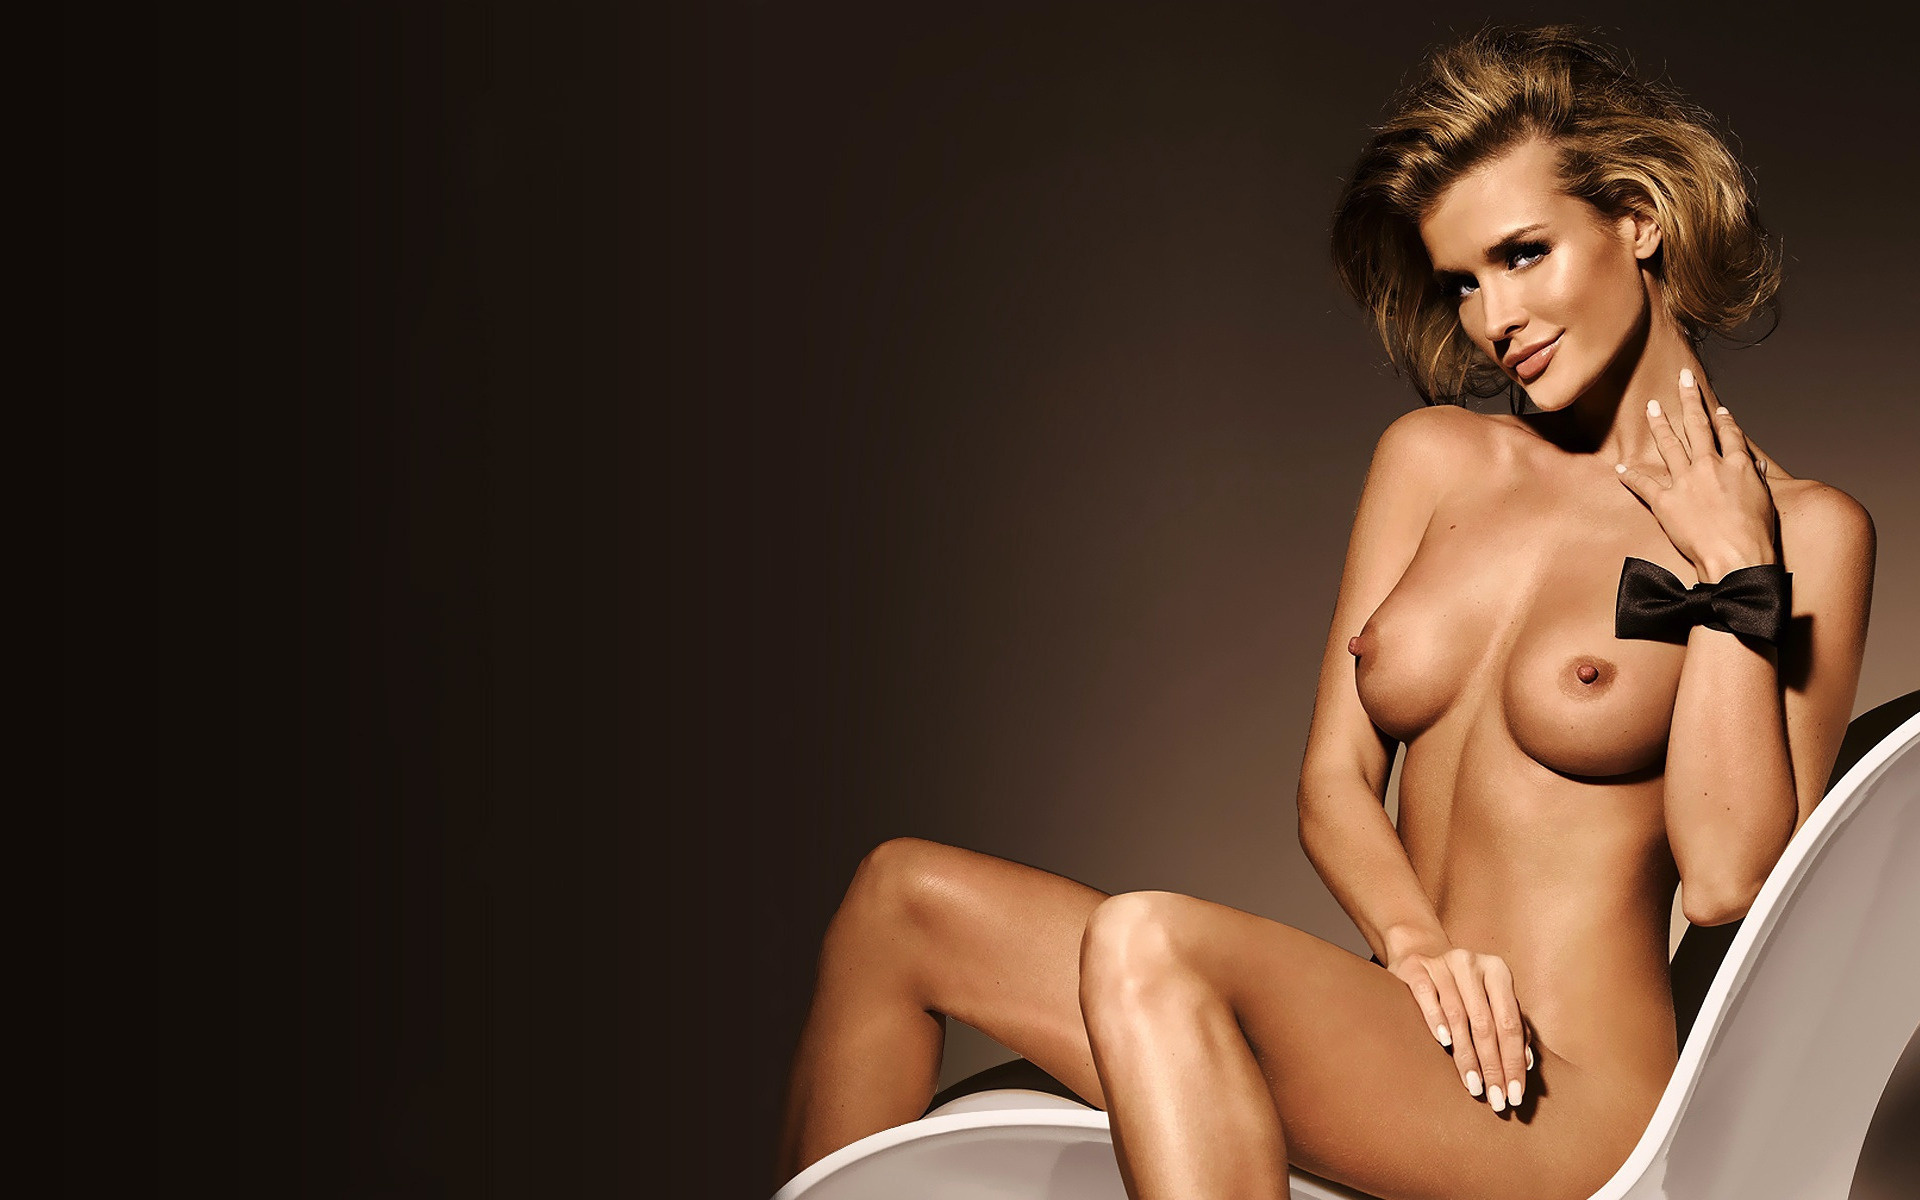 naruto female tsunade naked